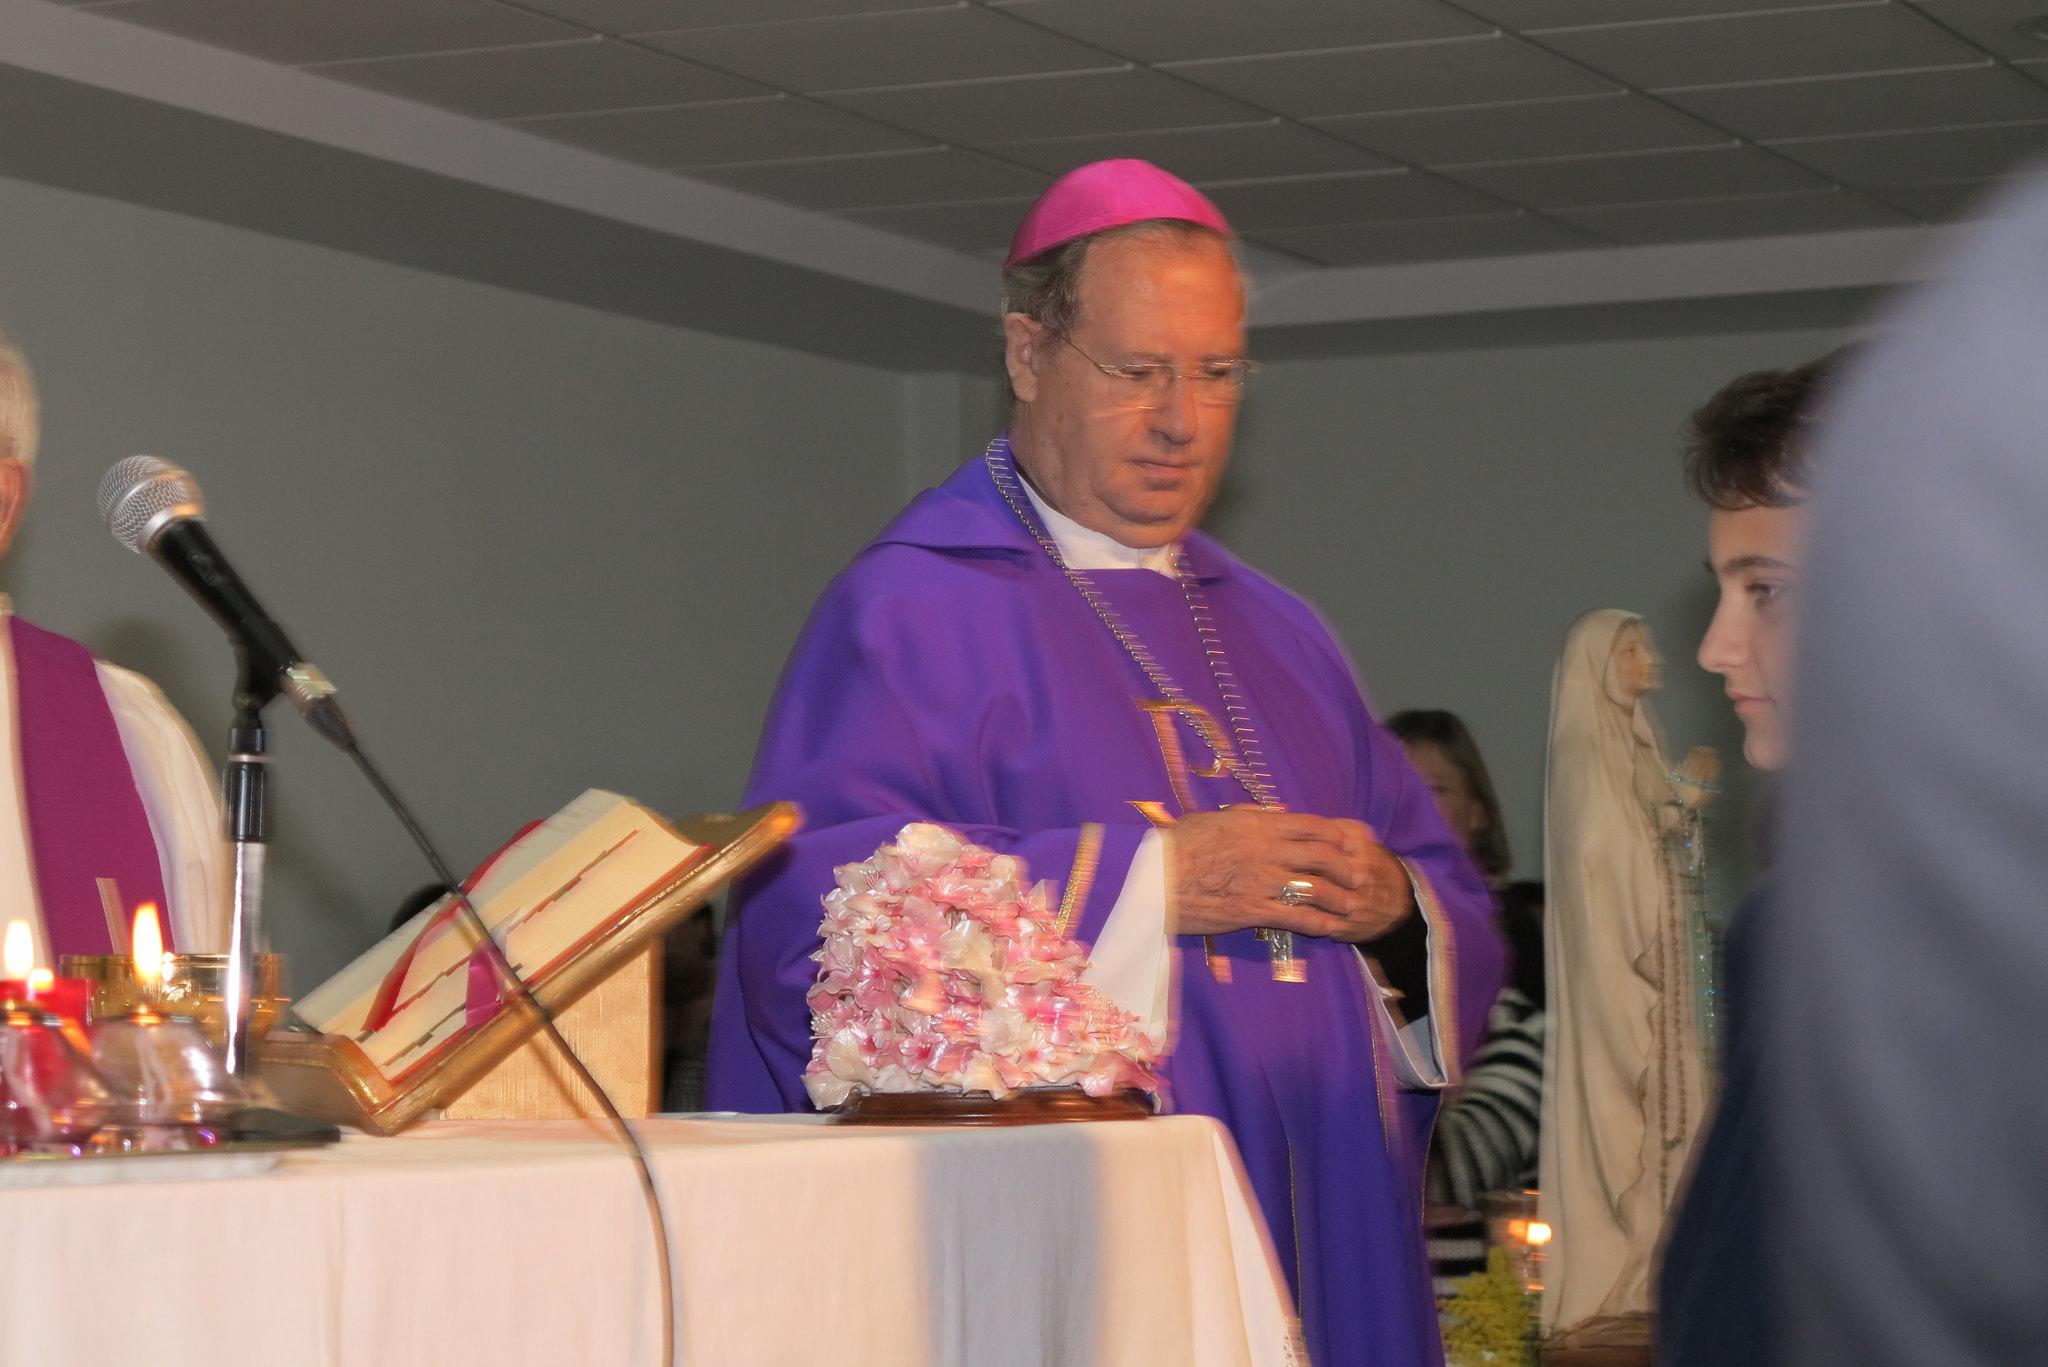 (2016-02-13) - Inauguración Virgen de Lourdes, La Molineta - Archivo La Molineta 2 (25)